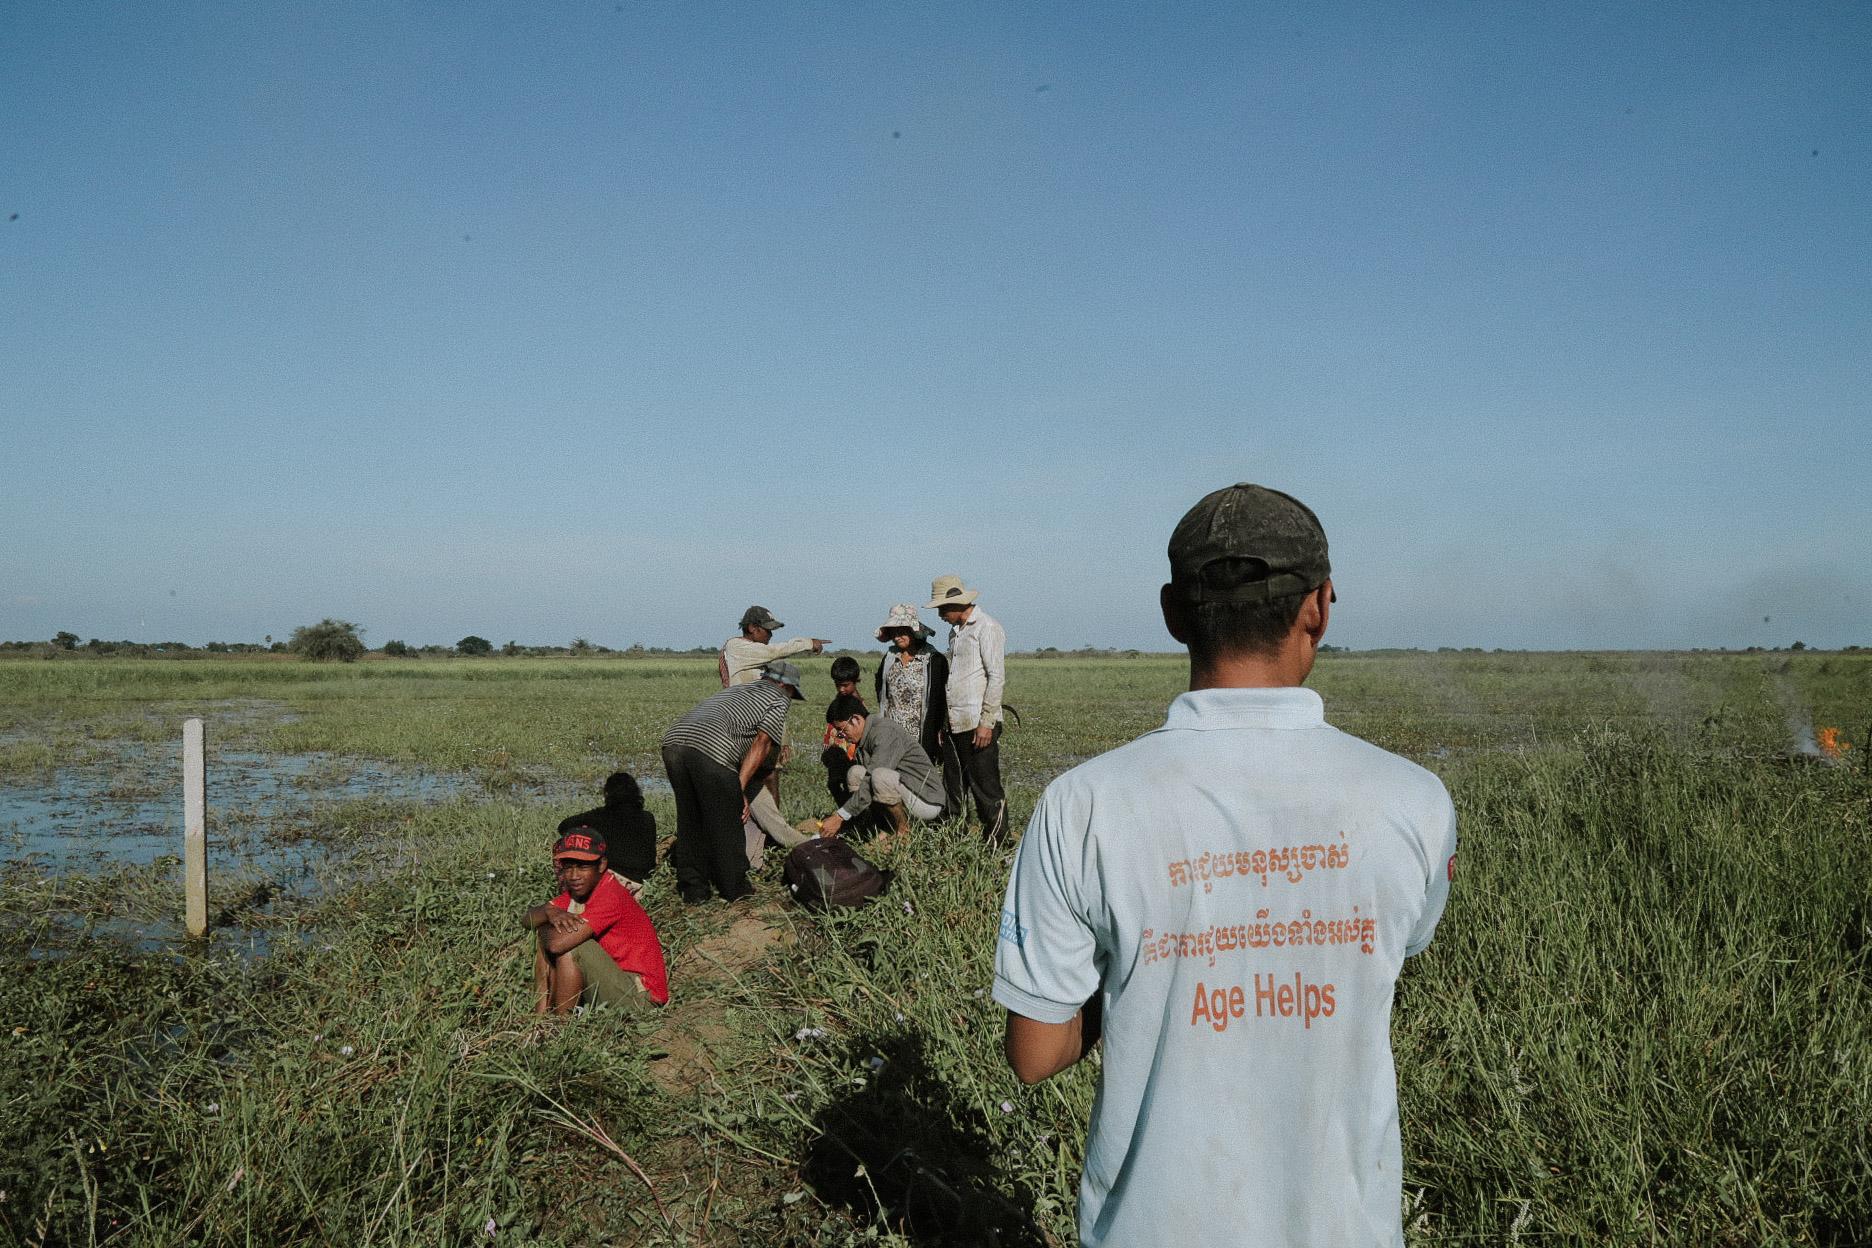 The Learning Institute_BakAmrek_Battambang_Cambodia_SEAFDEC 11